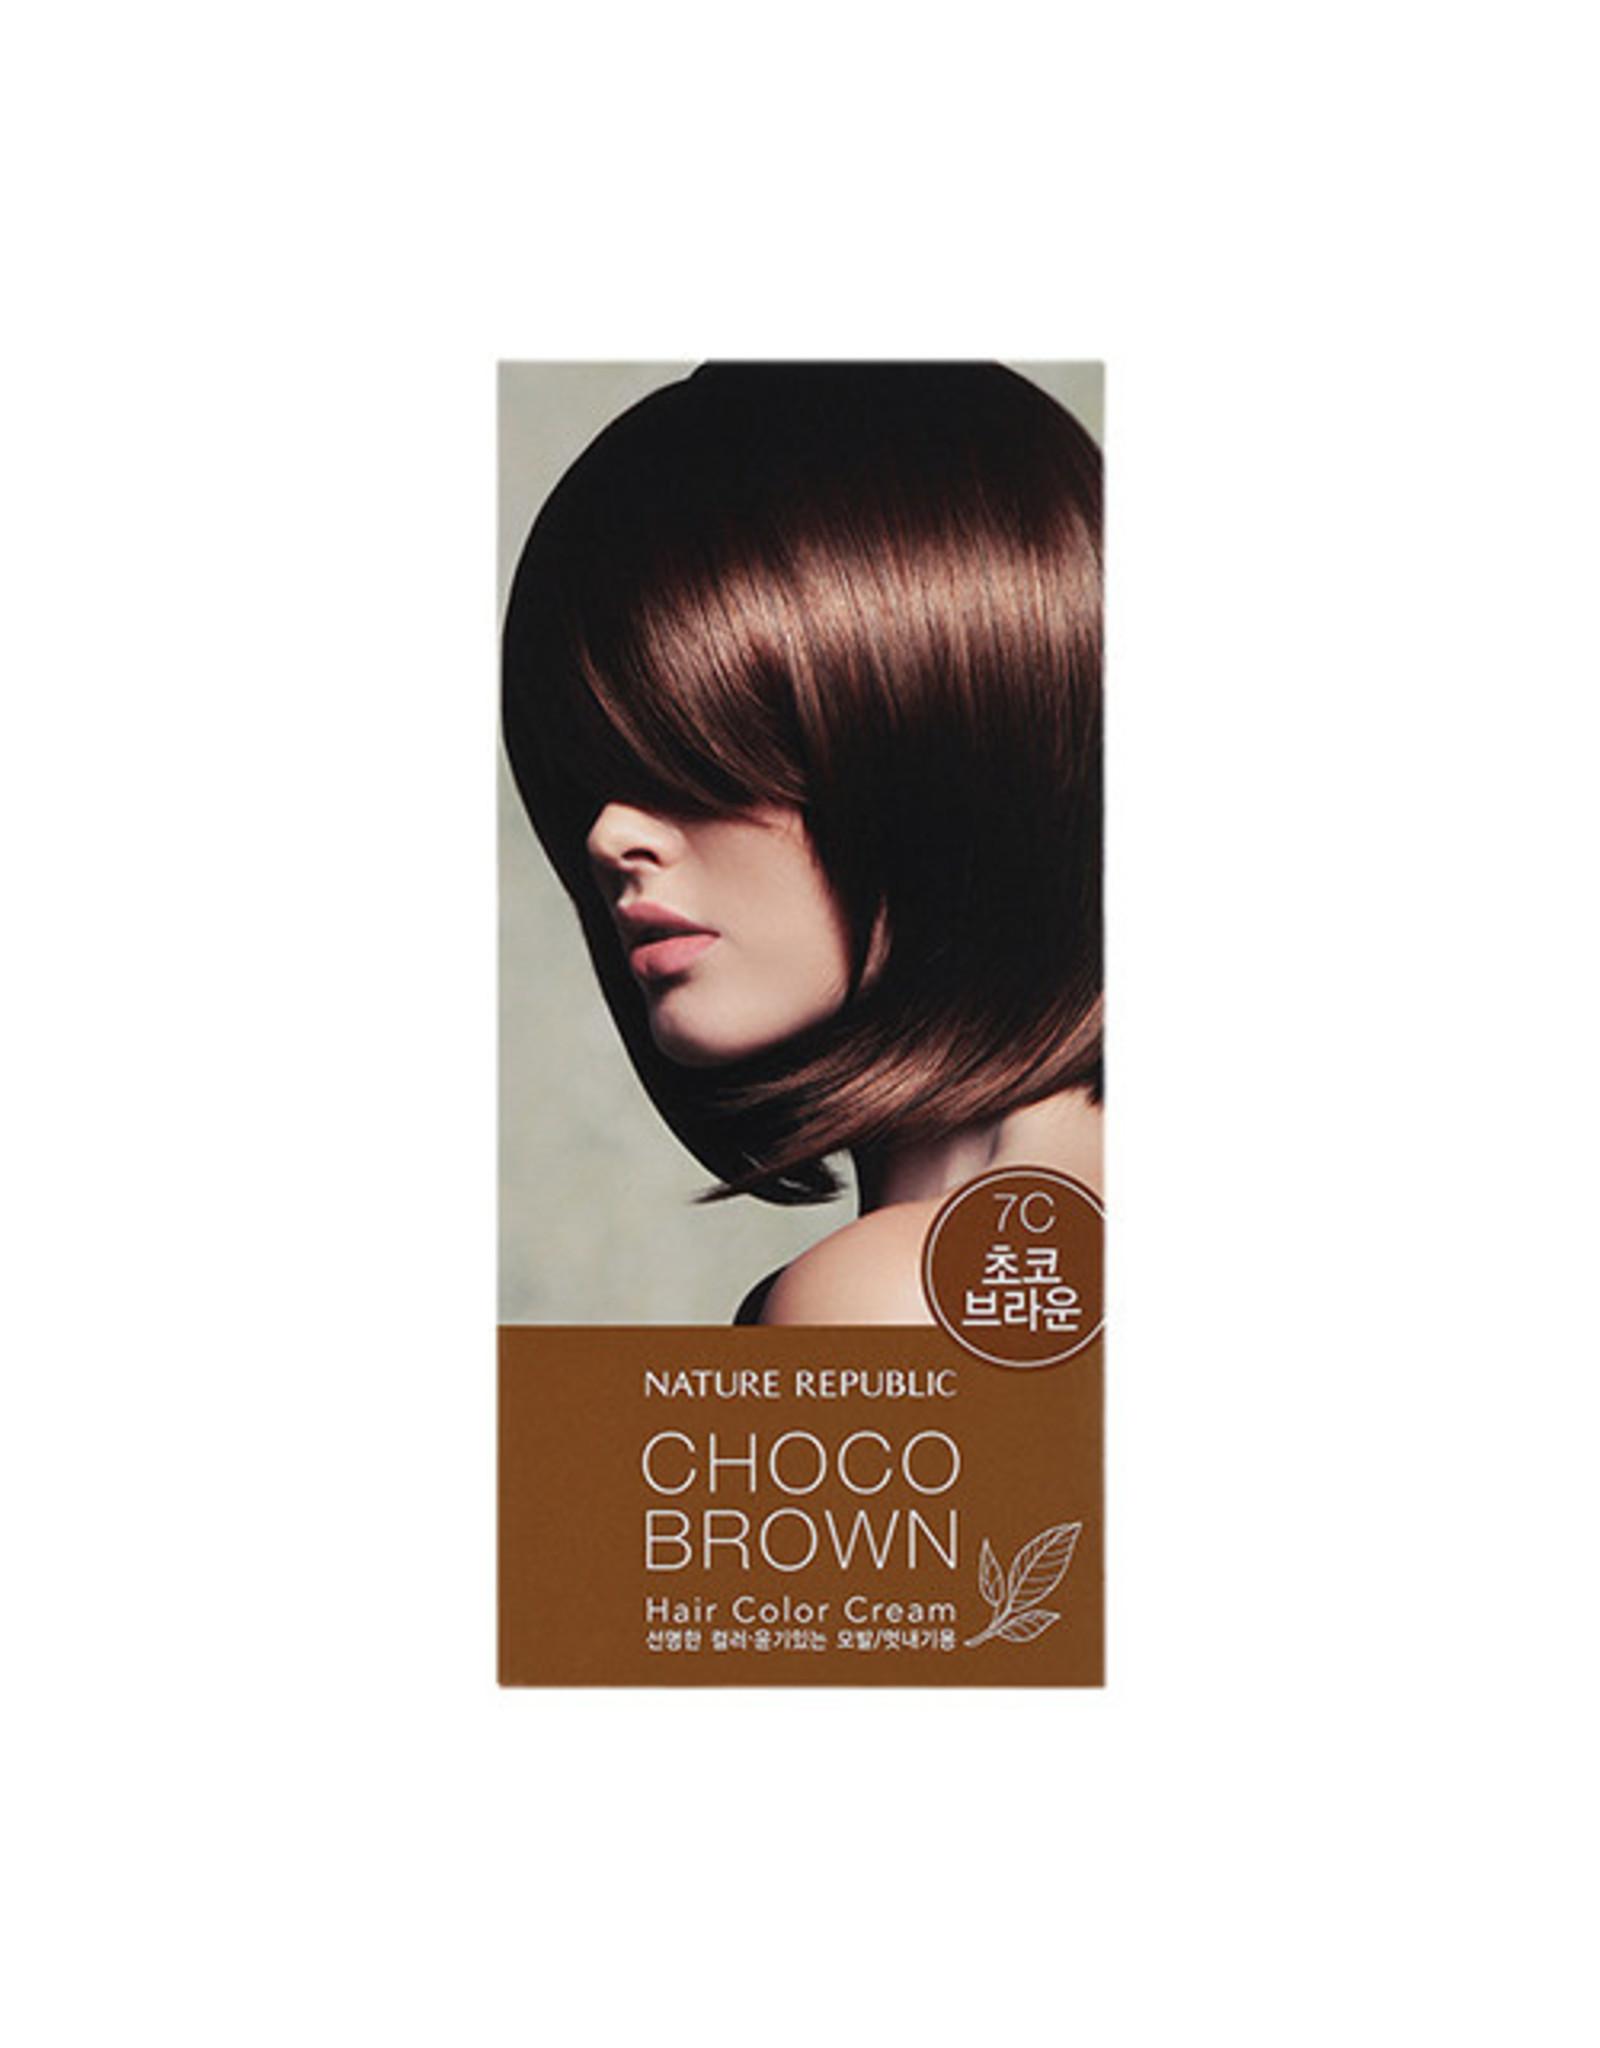 Hair&Nature Hair Color Cream 7Cchoco Brown